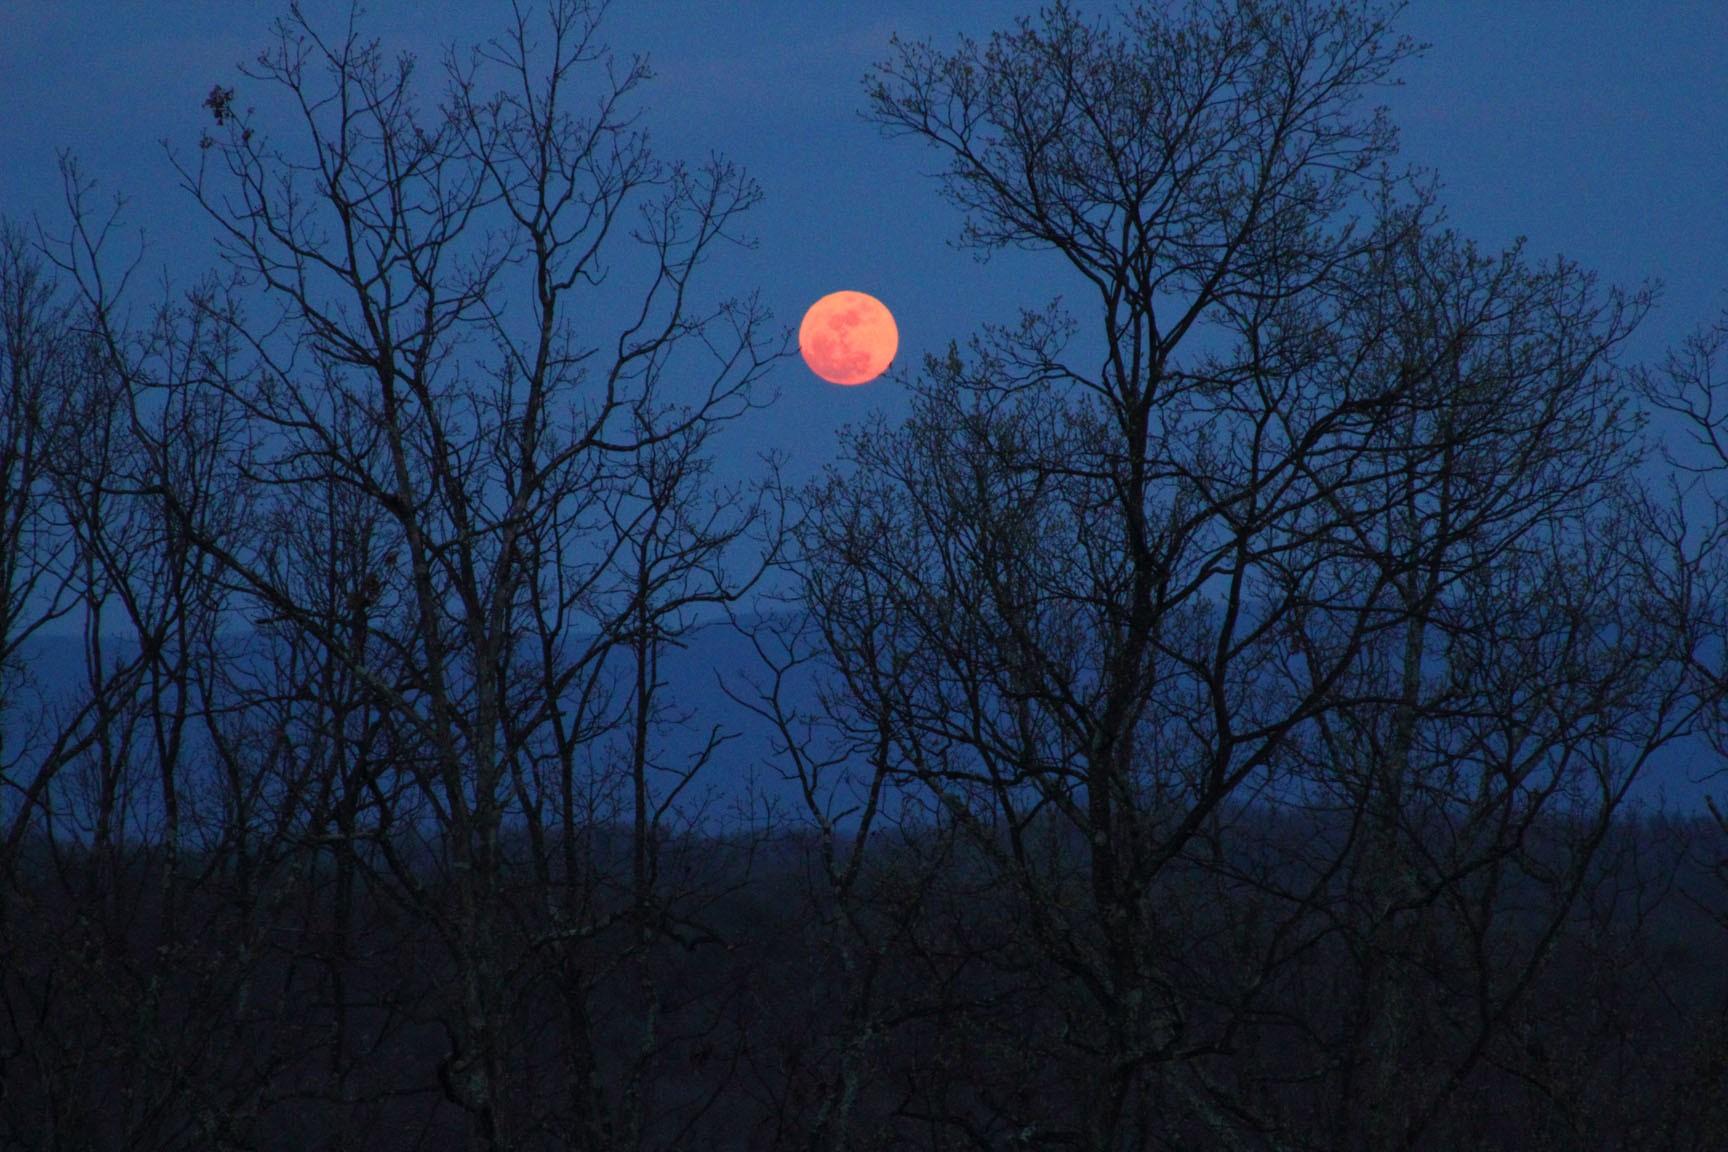 fenômeno da lua de sangue inspira misticismo (Foto: JosMetadi/flickr/creative commons)